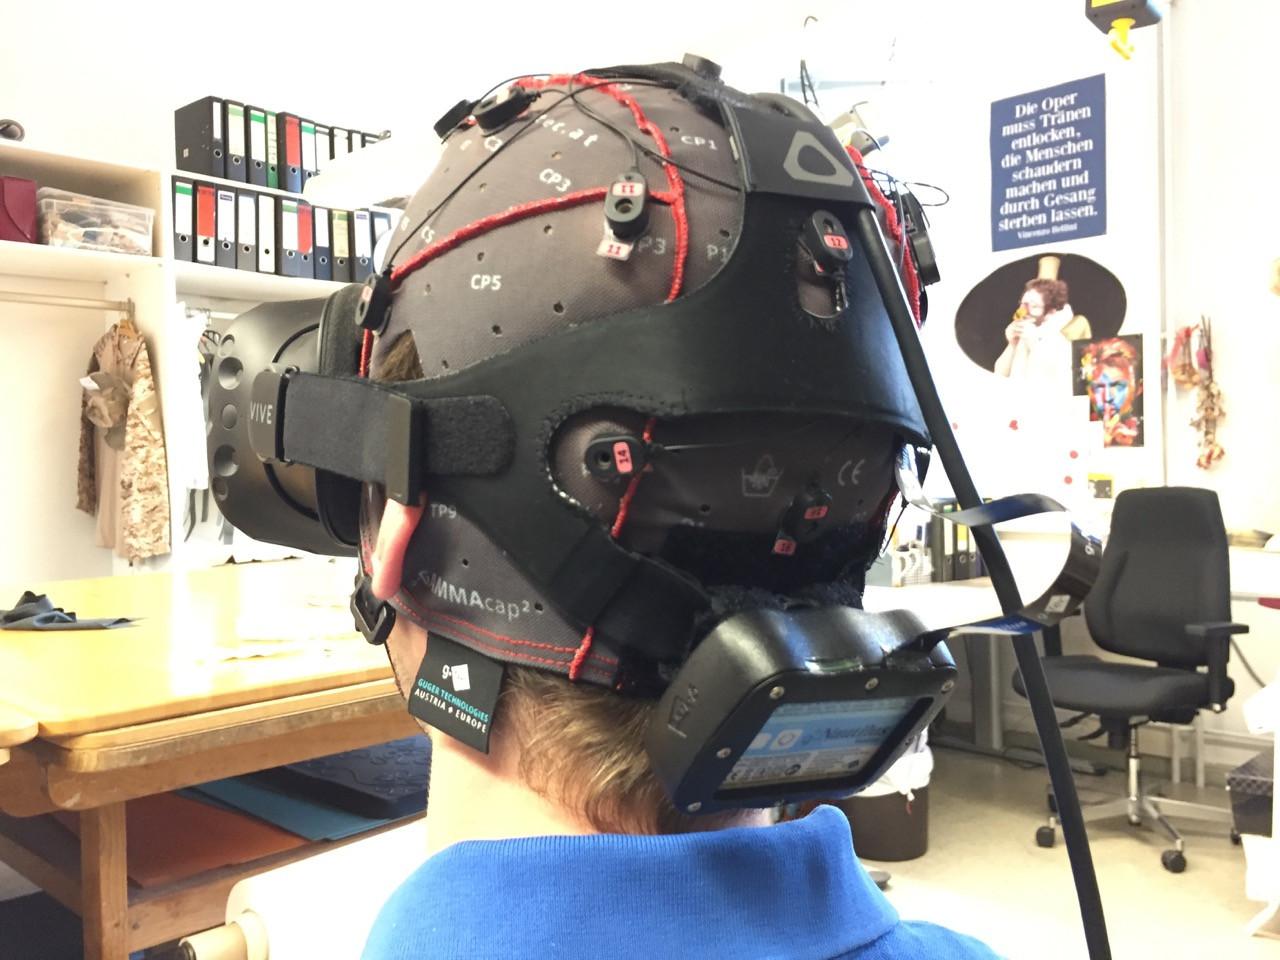 Immersive EEG: Evaluating Electroencephalography in Virtual Reality